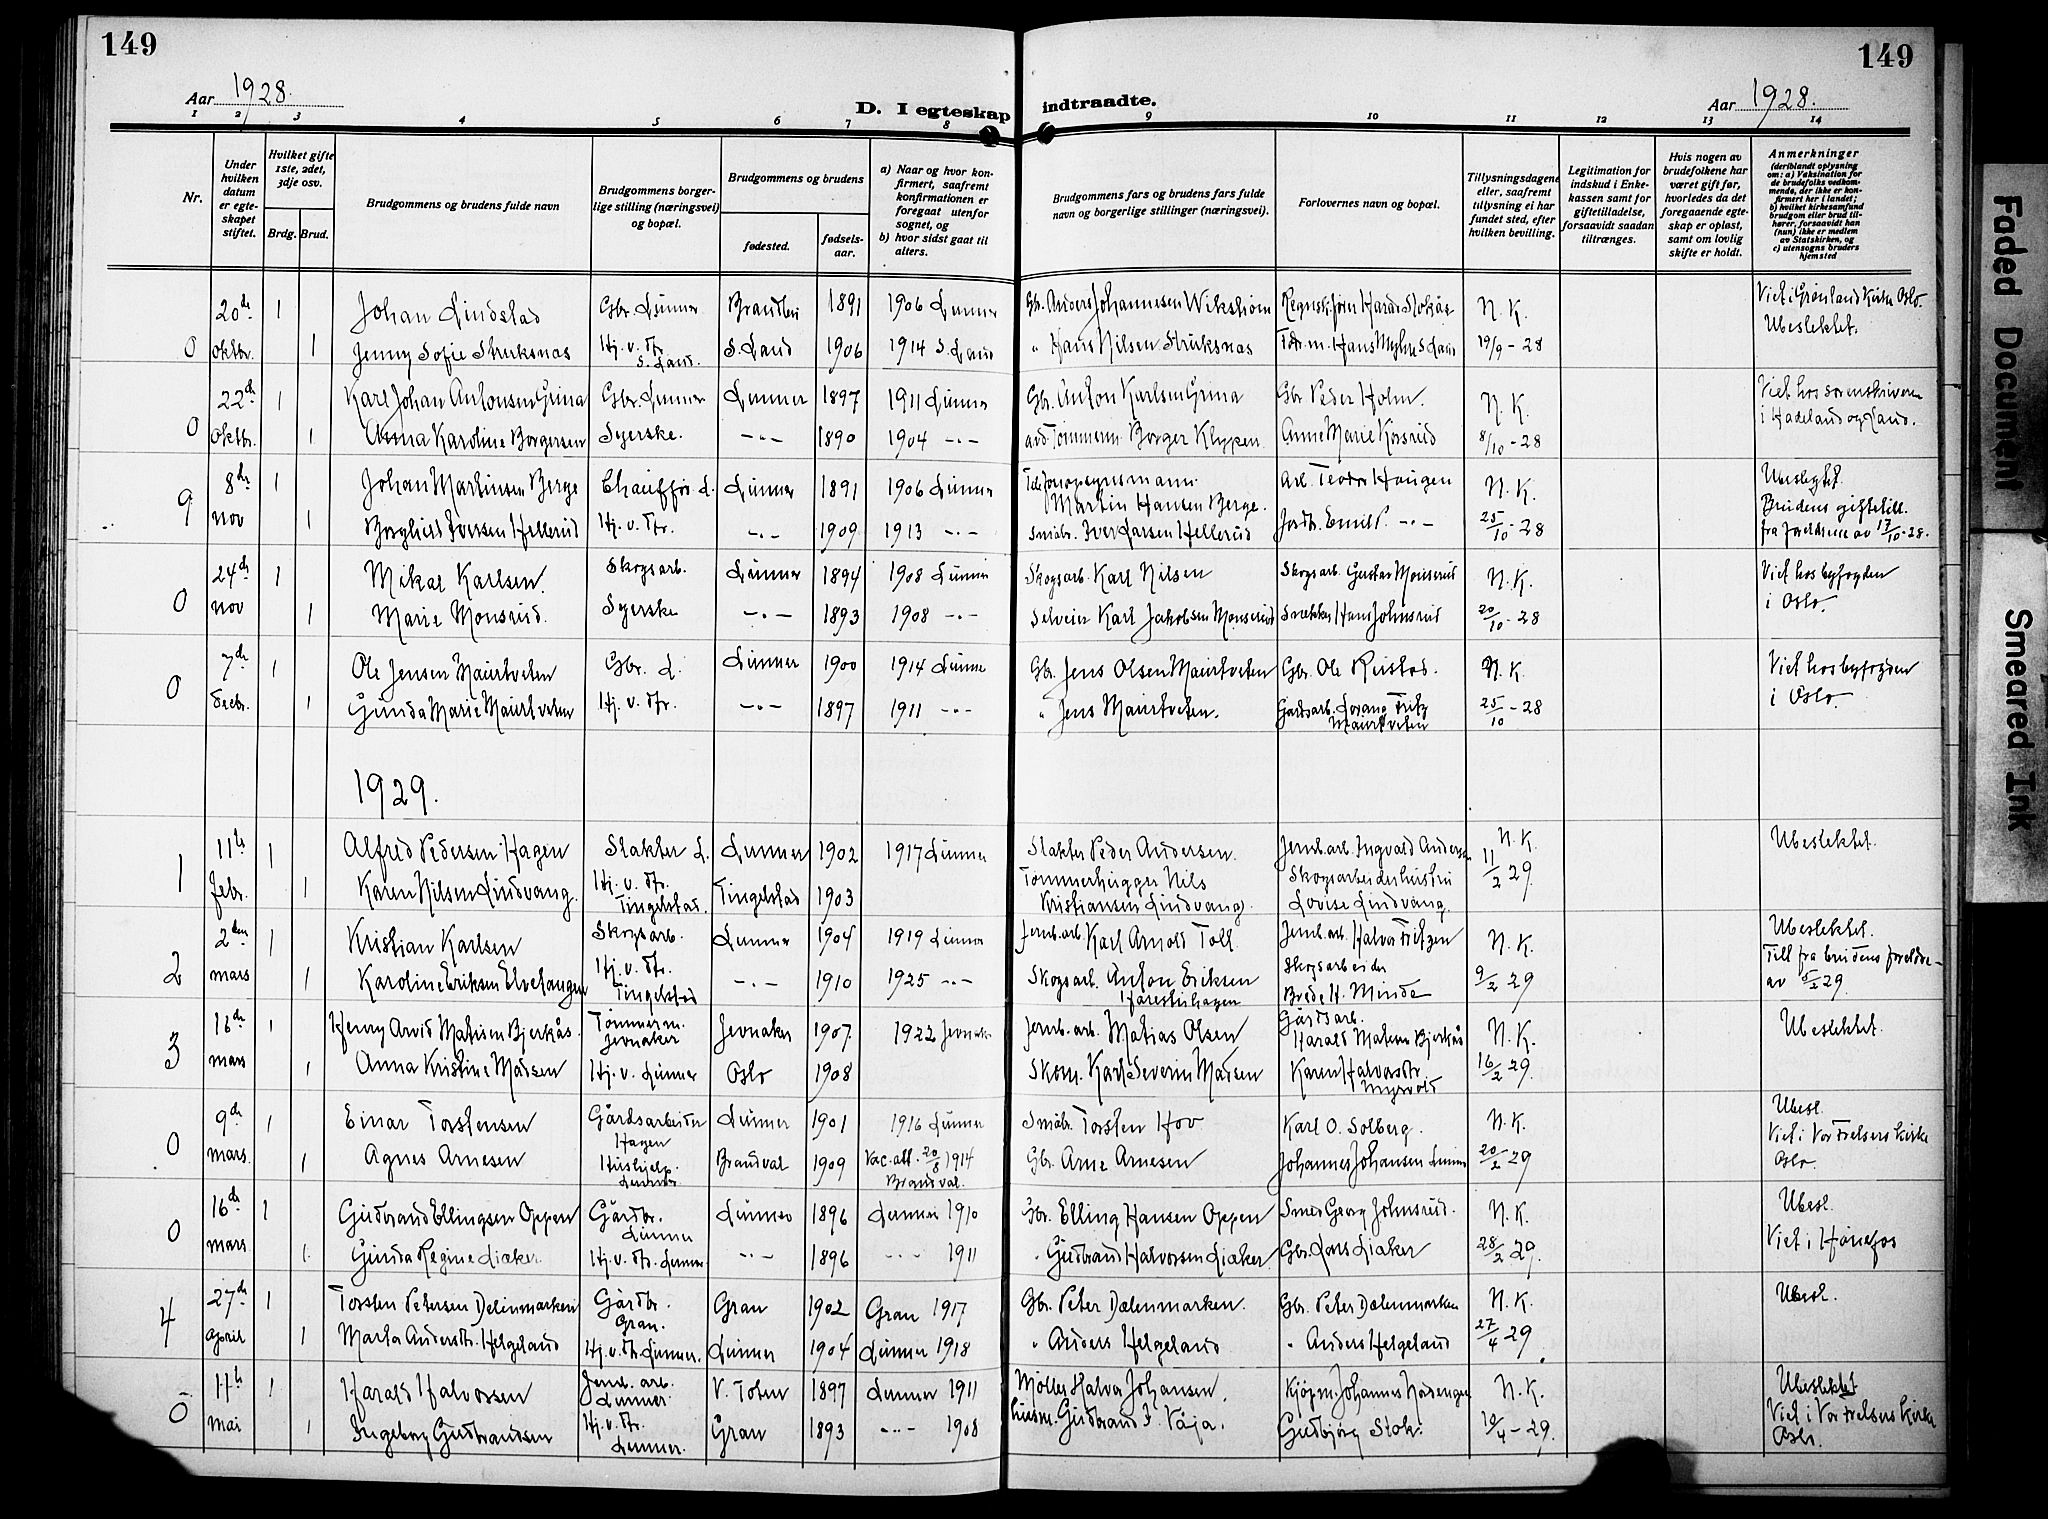 SAH, Lunner prestekontor, H/Ha/Hab/L0002: Klokkerbok nr. 2, 1923-1933, s. 149